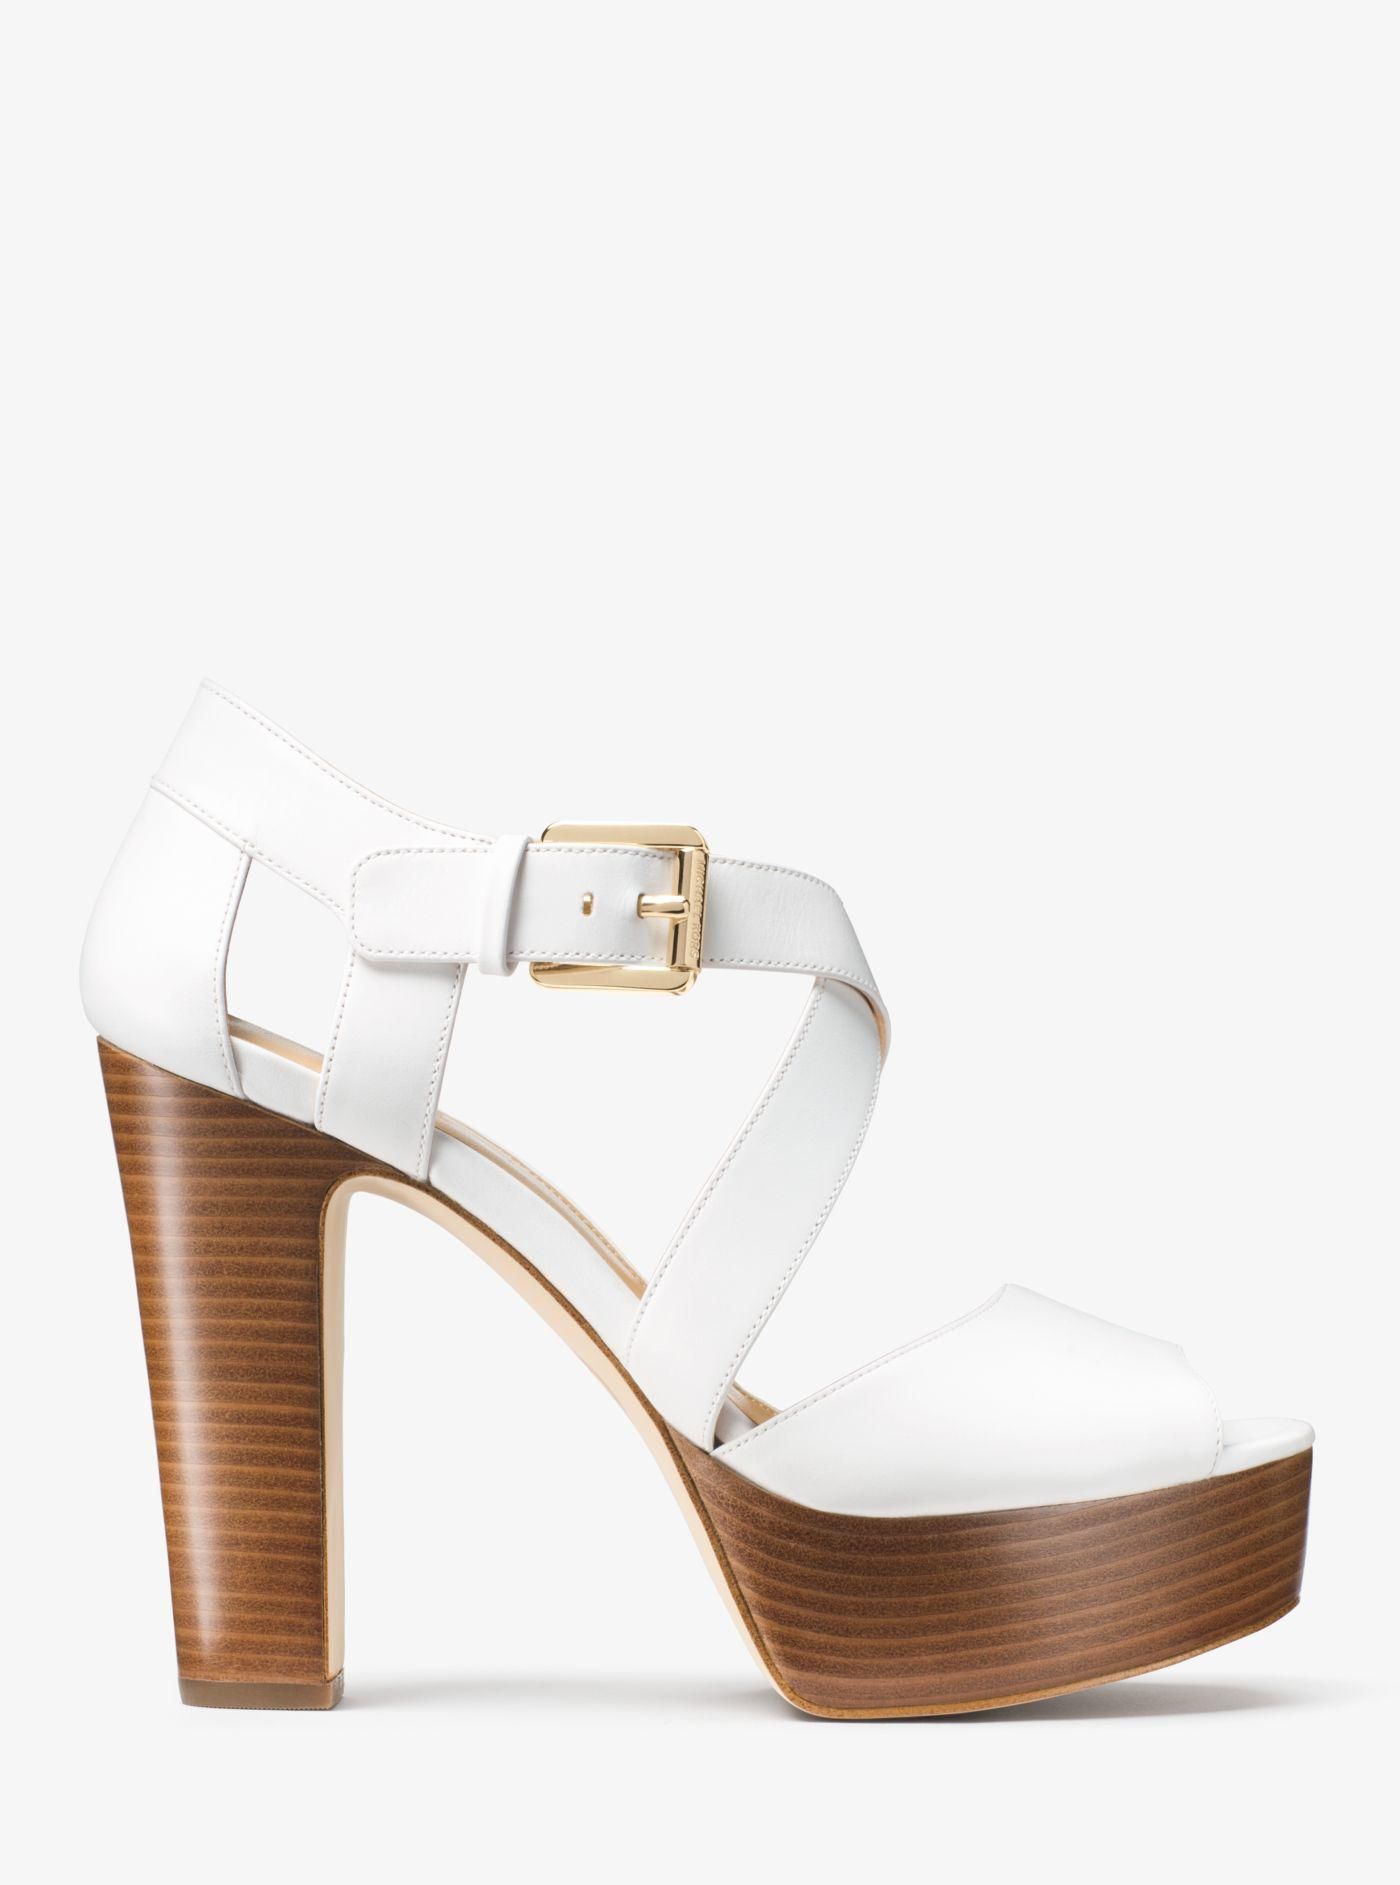 a11c99f512d Lyst - Michael Kors Jodi Leather Platform Sandal in White